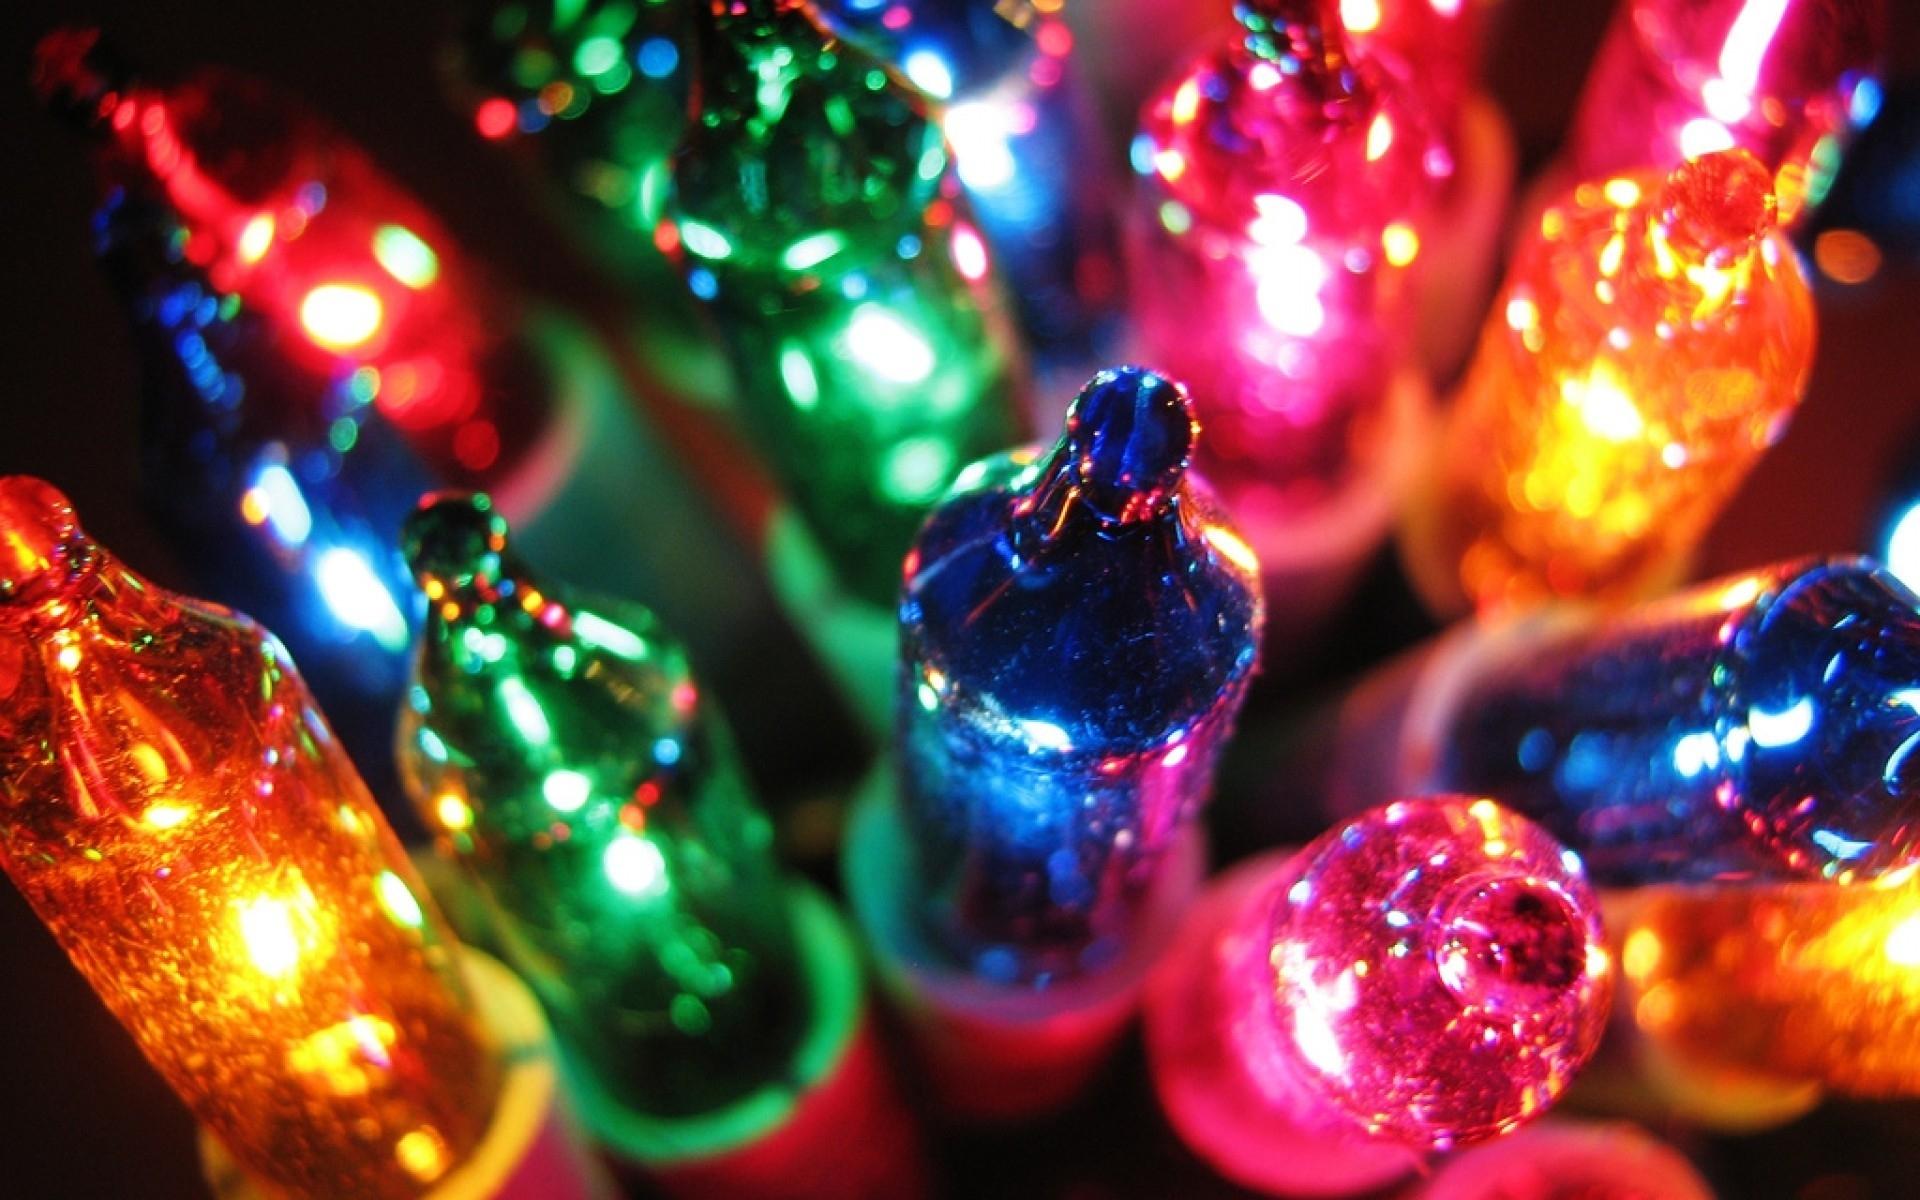 colorful-christmas-lights-desktop-background-hd-wallppaer